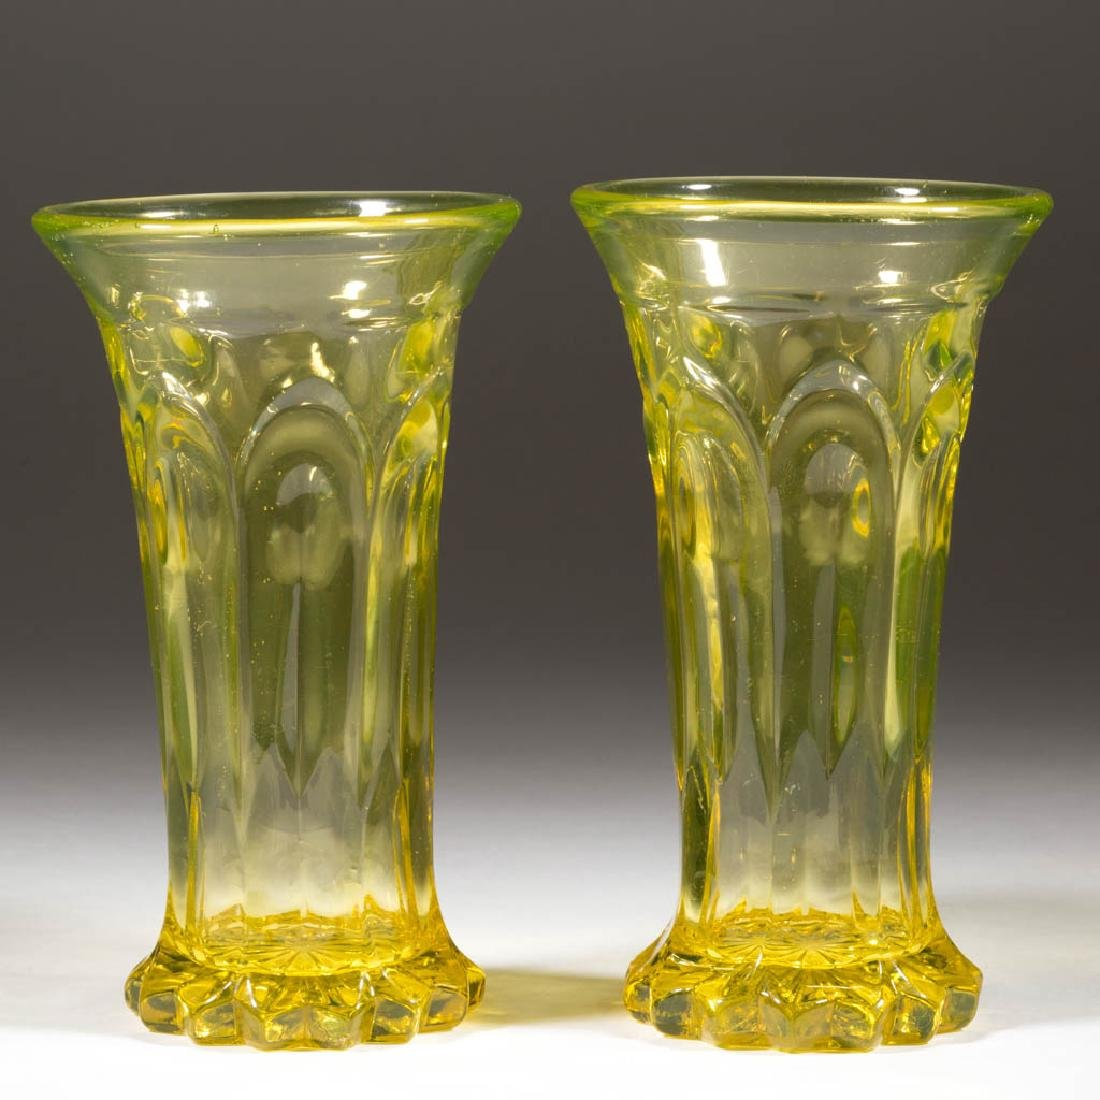 UNIDENTIFIED PRESSED FLINT GLASS PAIR OF VASES